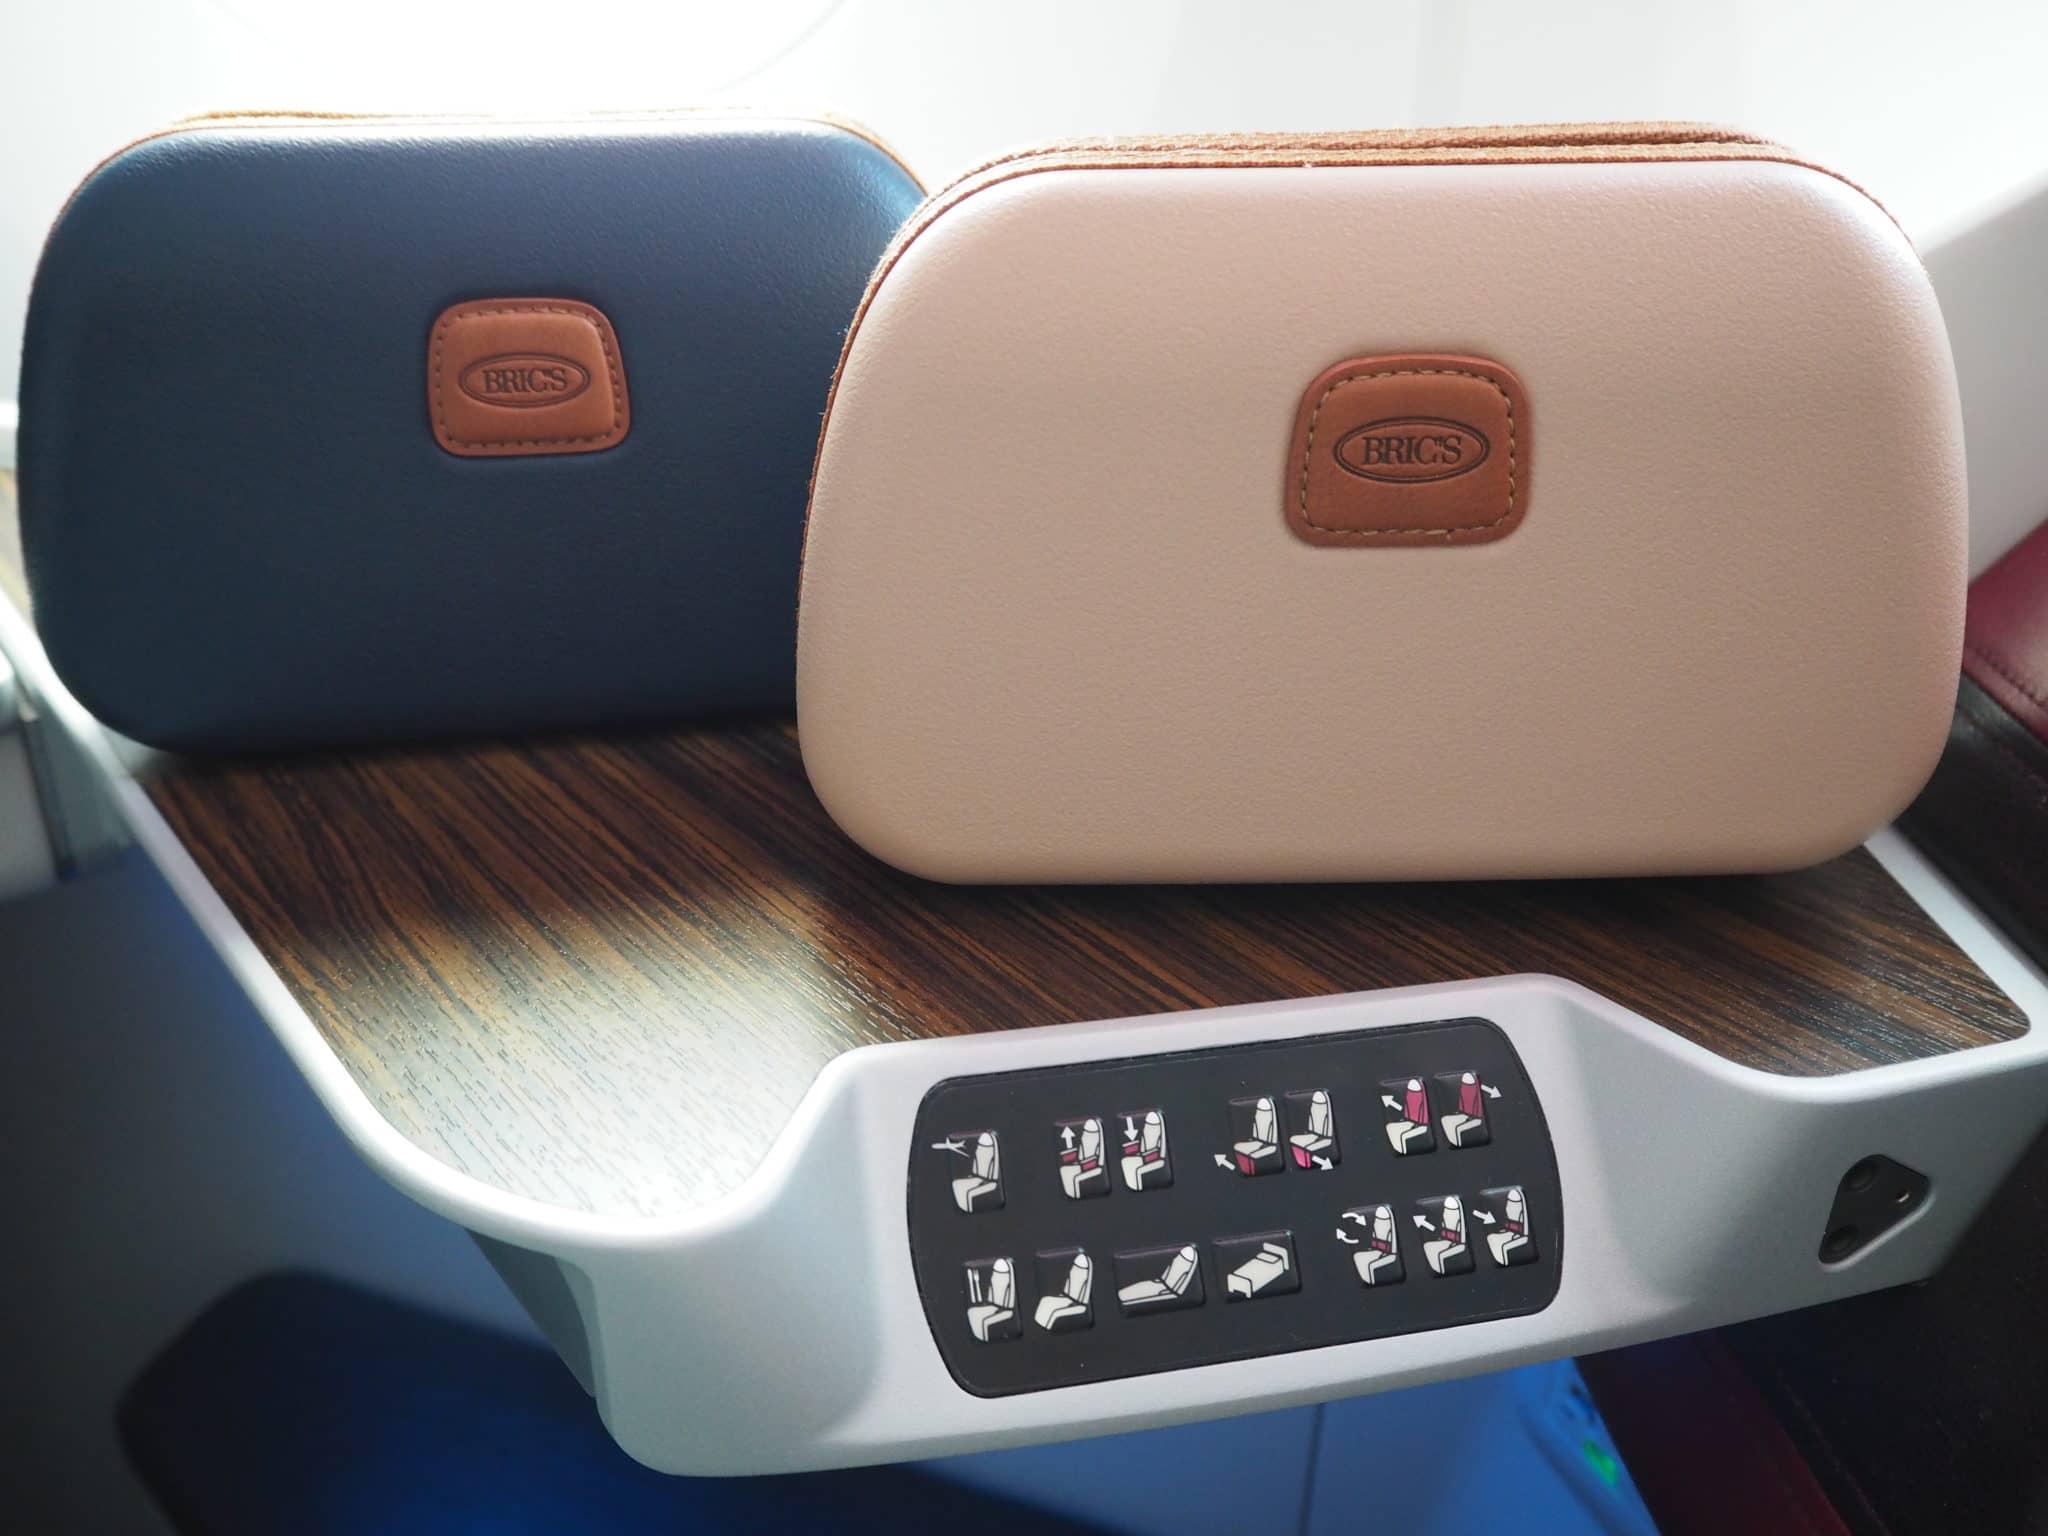 Qatar Airways Business Class Amenity Kits